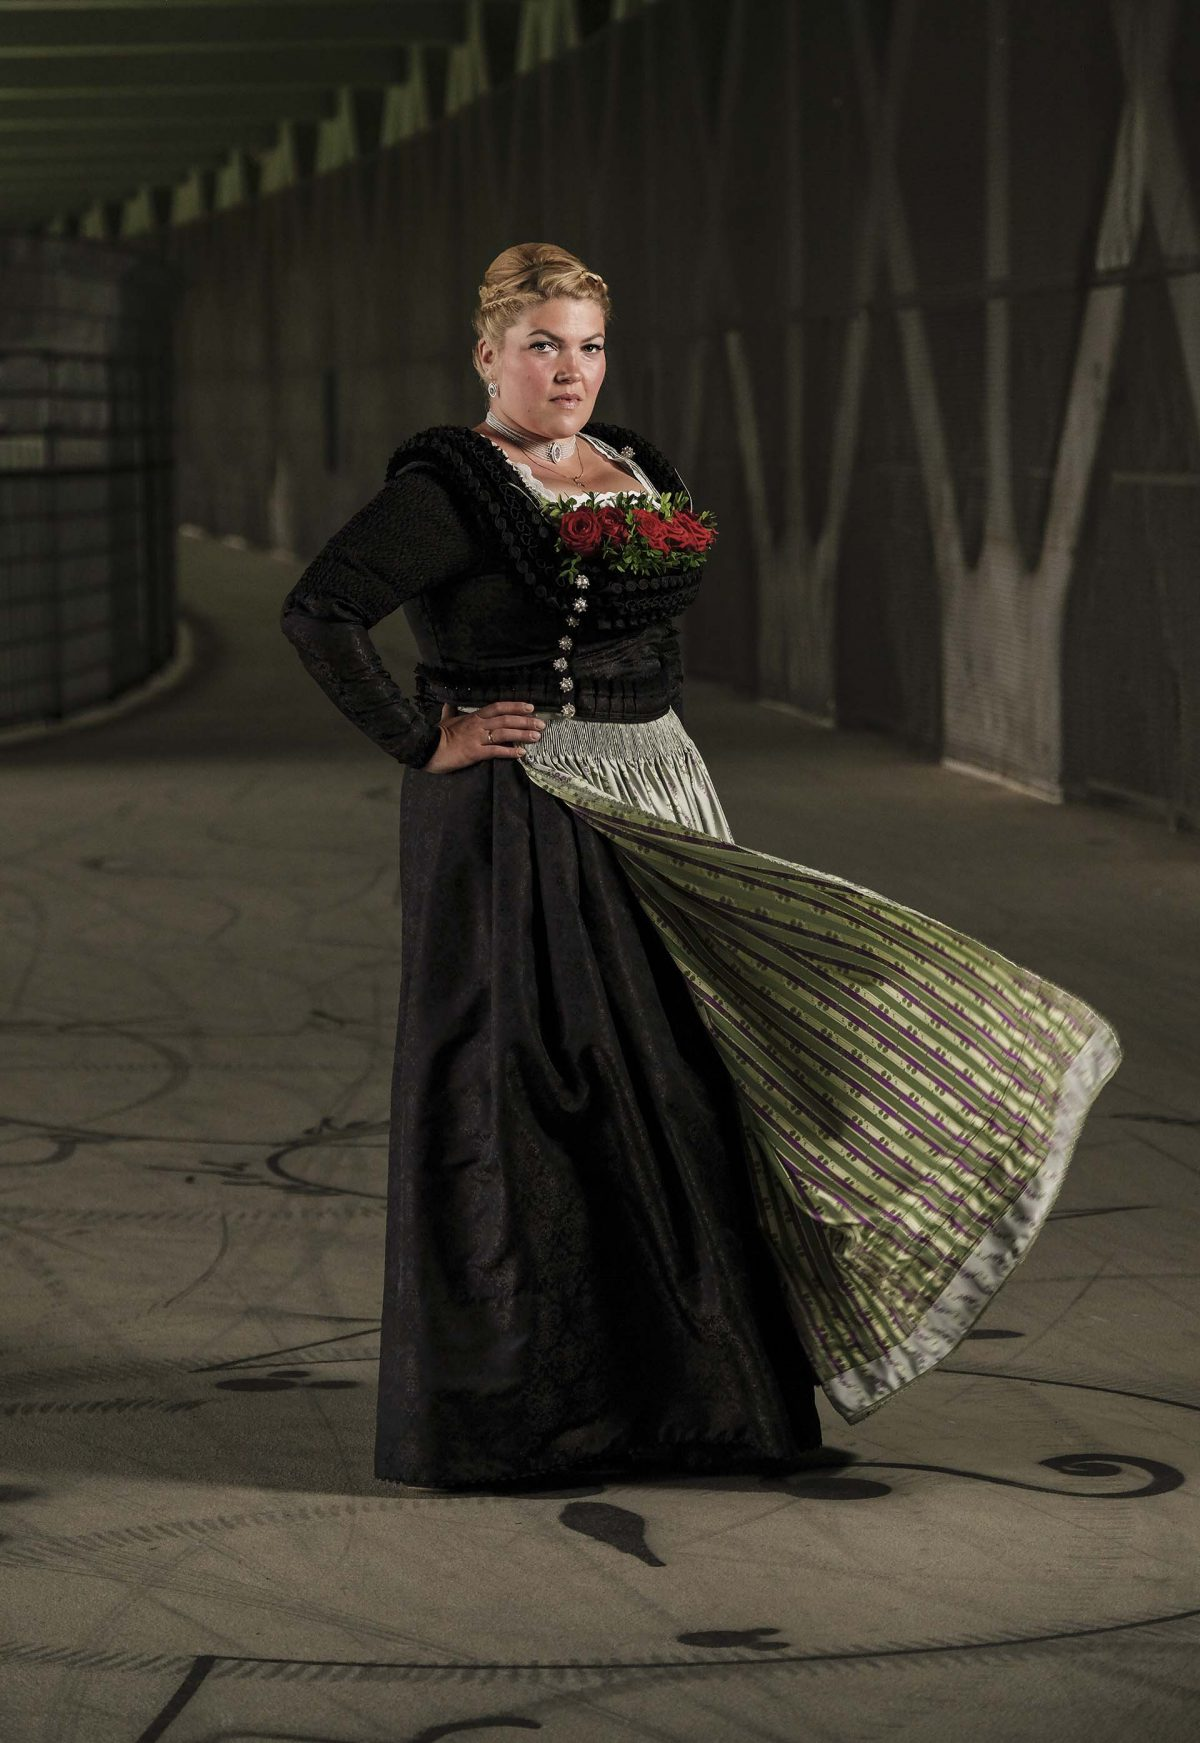 Hochzeit-shooting-fotograf-tegensee-schliersee-andreas-leder Schalk Gwand Shooting